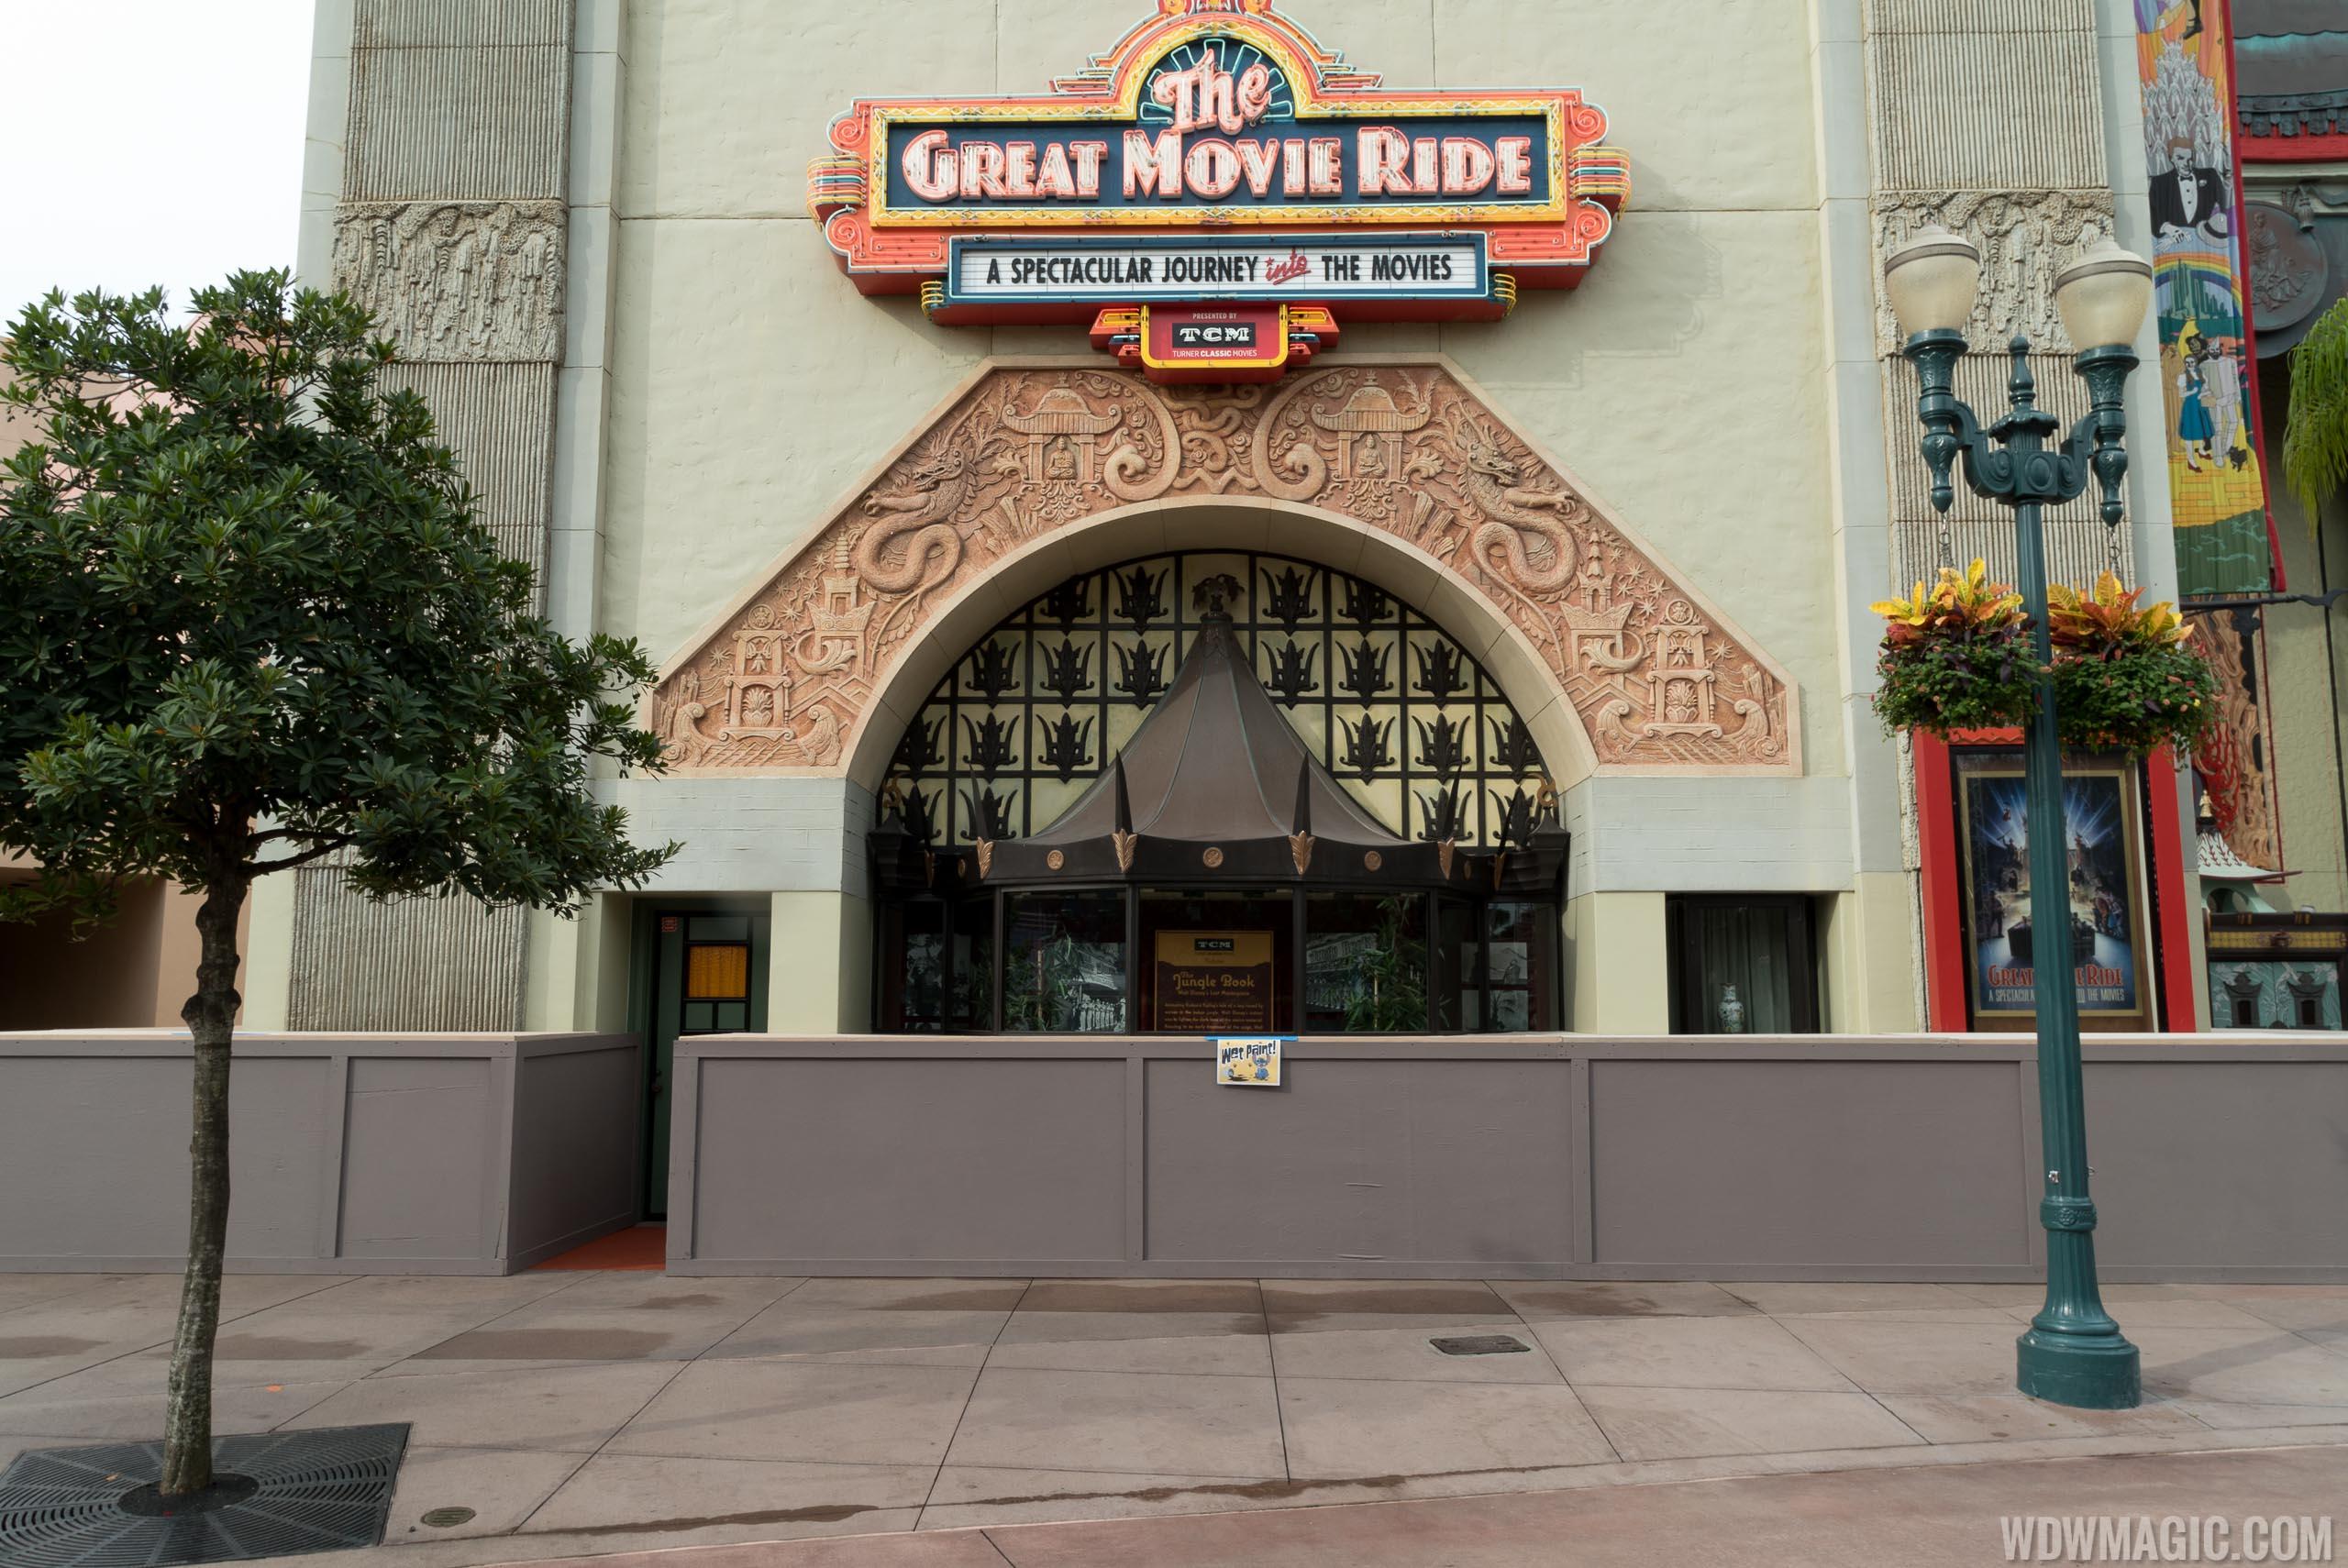 The Great Movie Ride exterior refurbishment